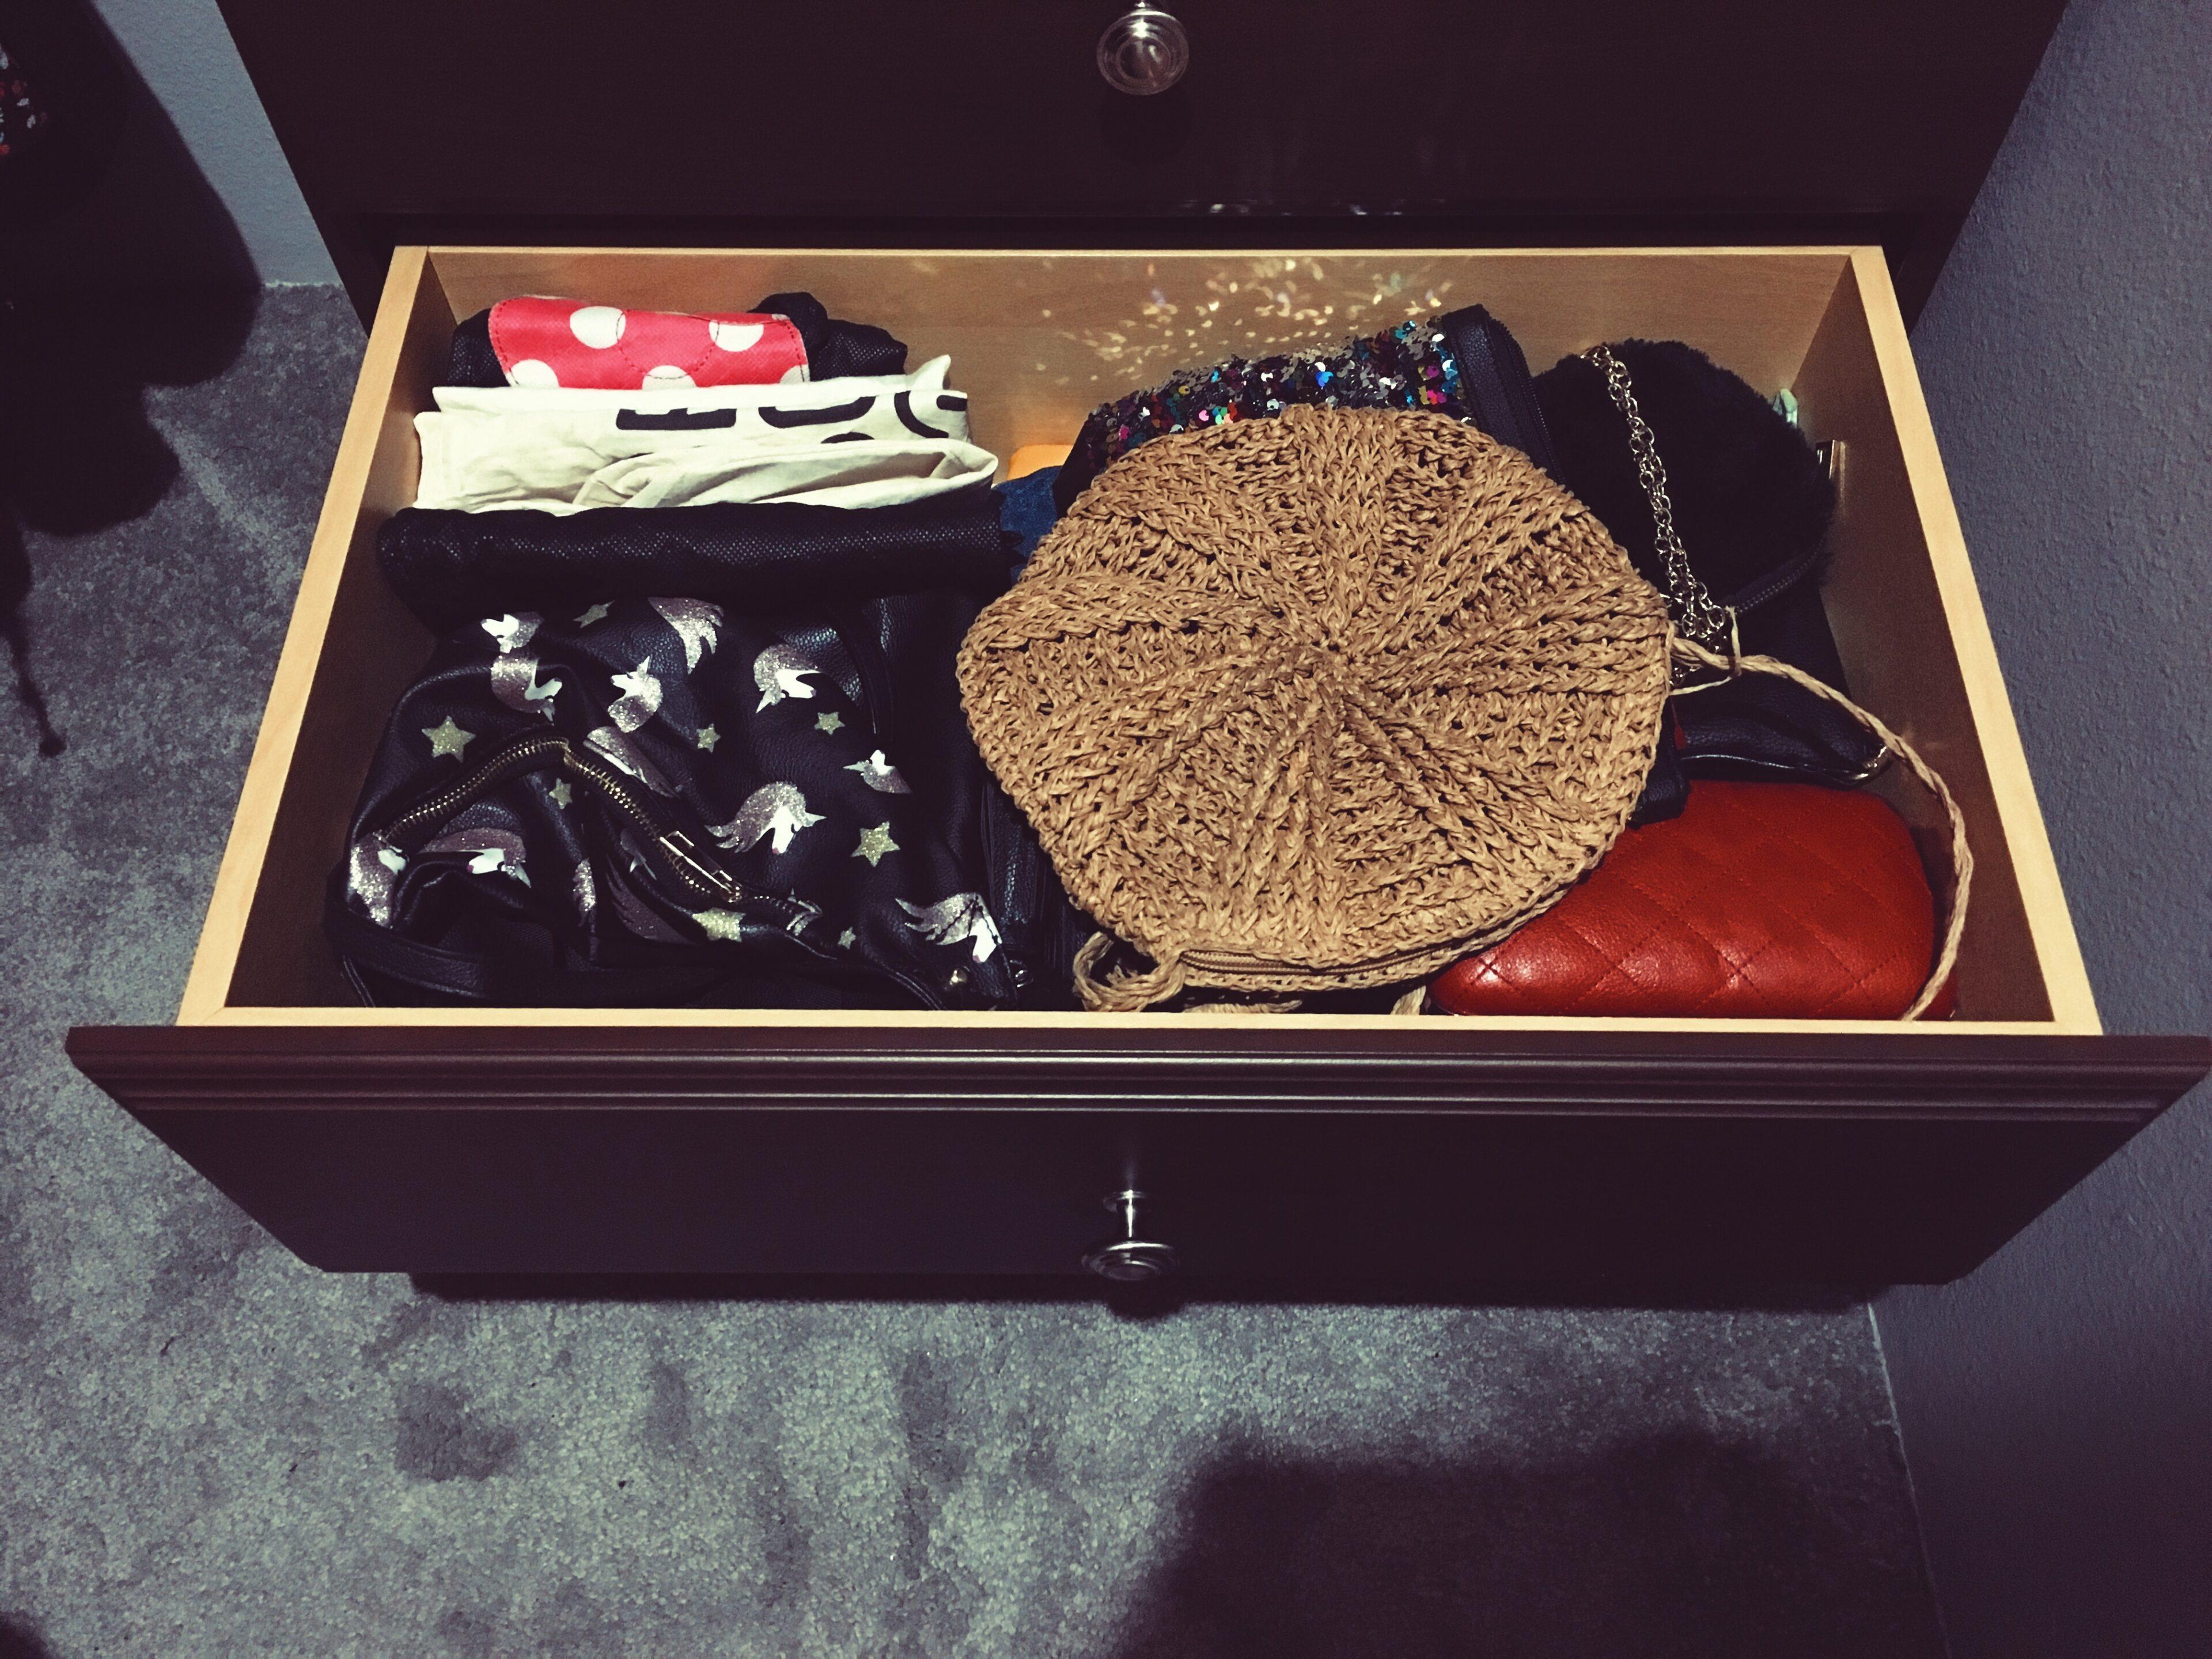 purse storage-closet organization-how to organize purses-wear who you are